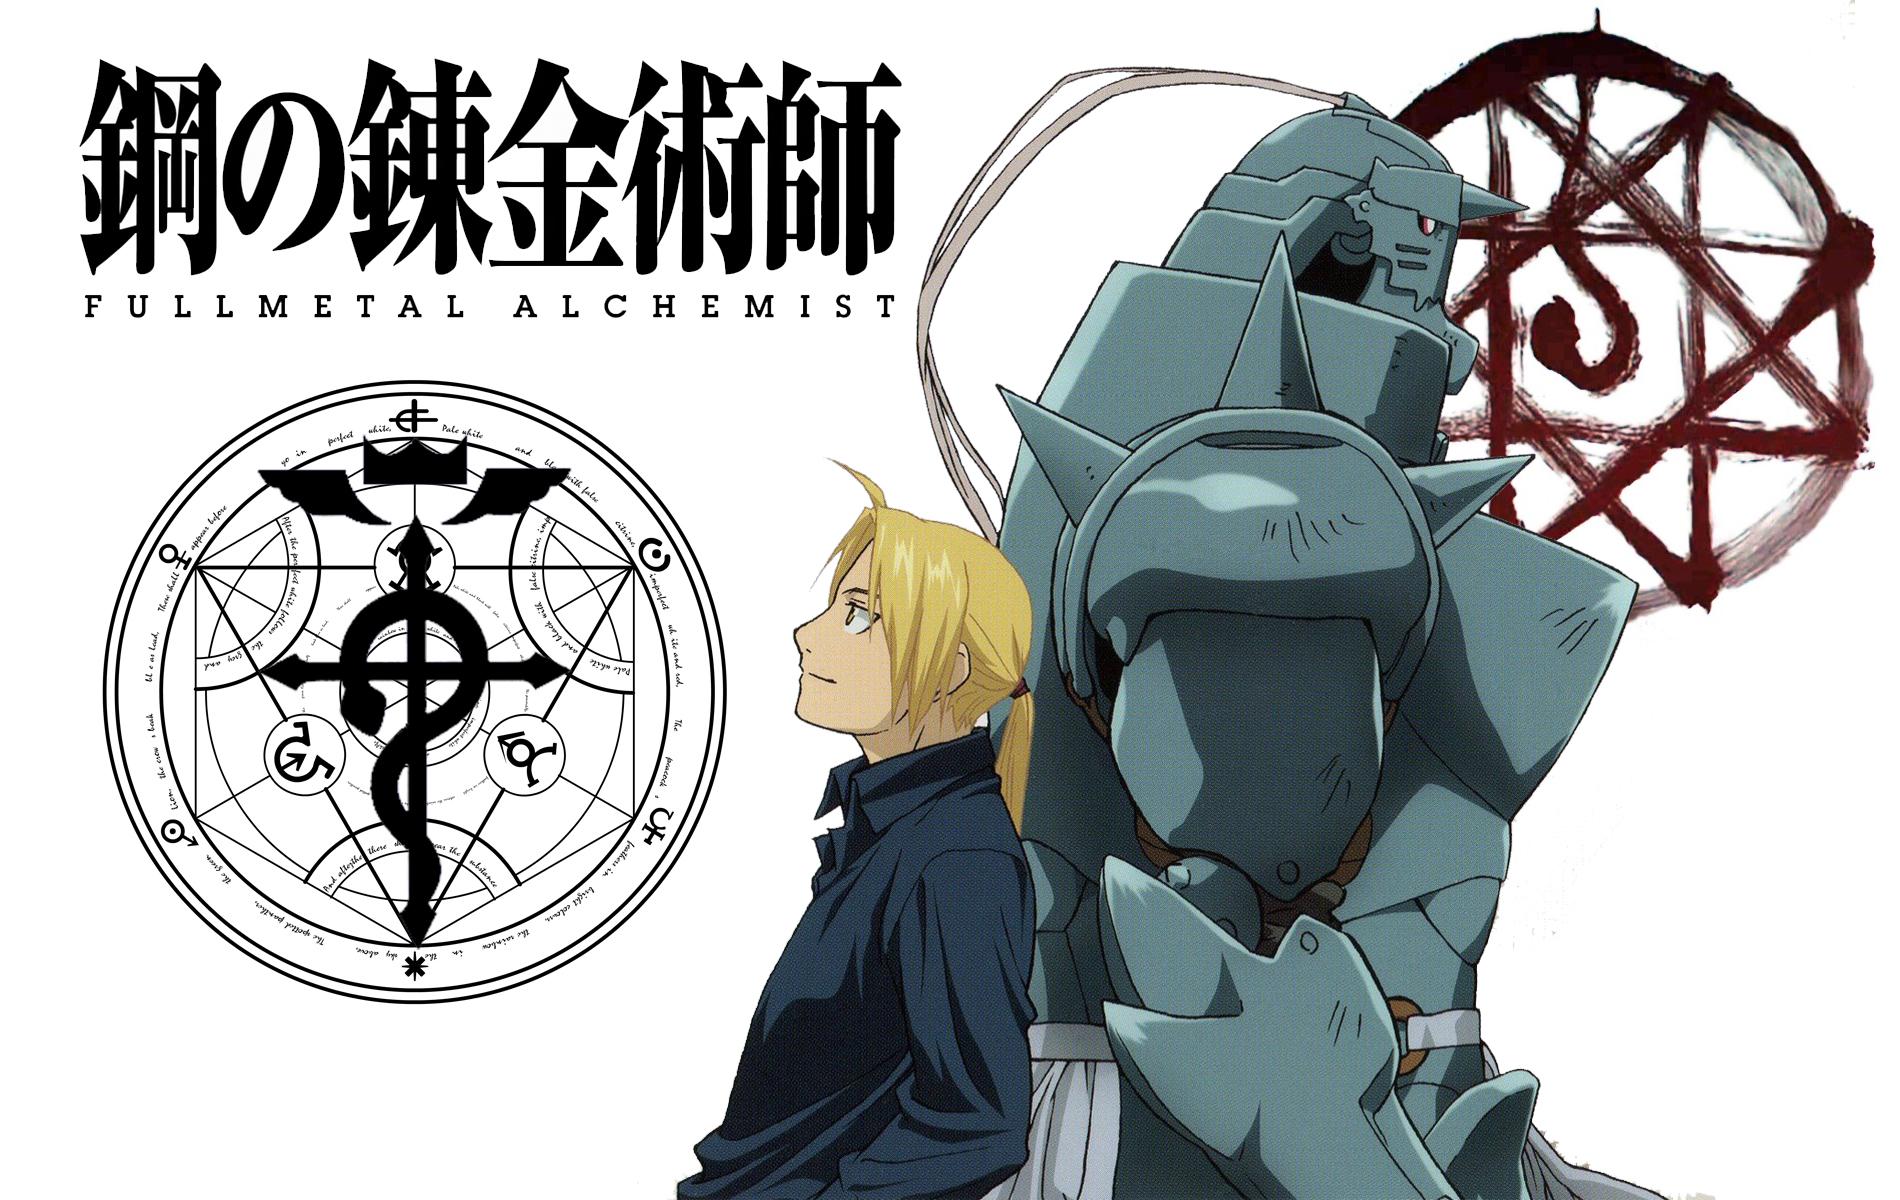 77 Fullmetal Alchemist Brotherhood Wallpaper On